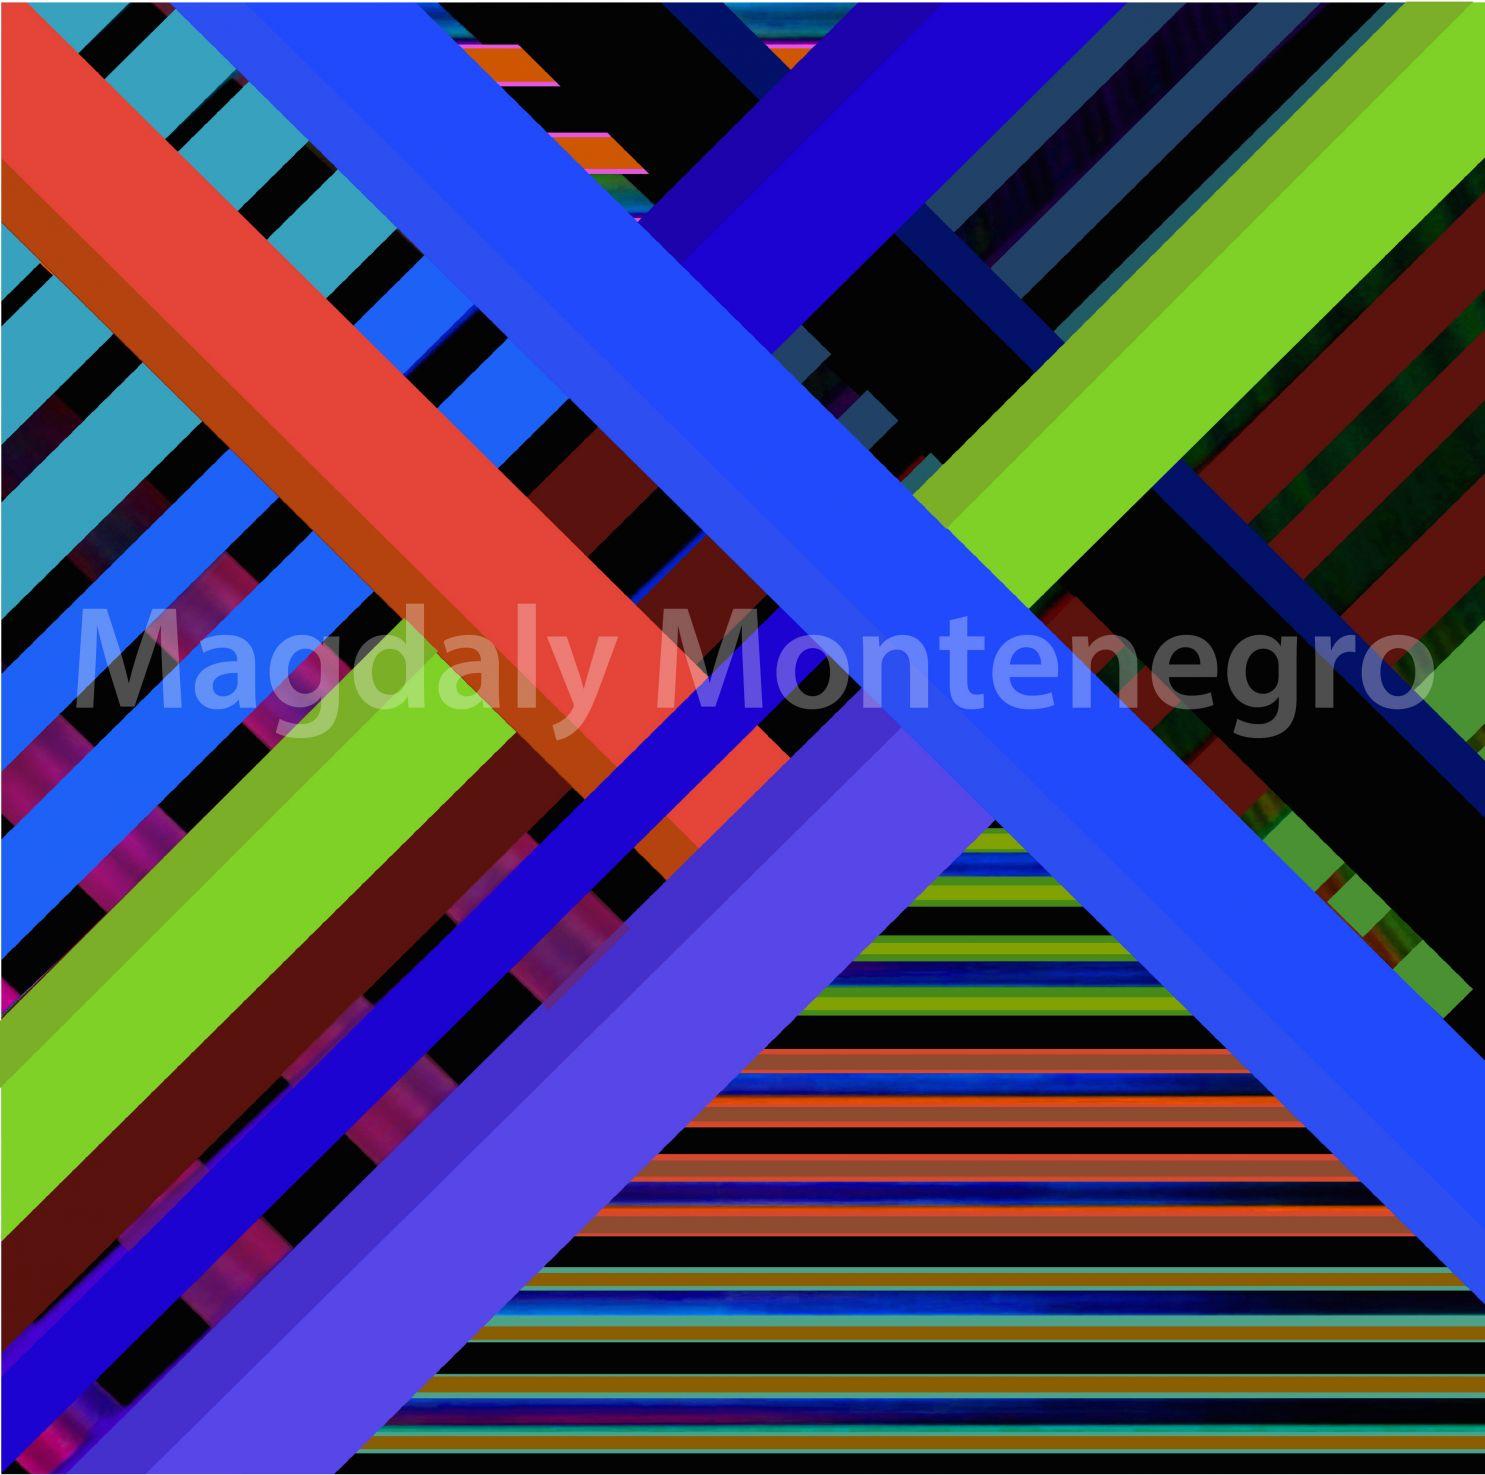 Diagonals 2 (2018) - Magdaly Montenegro